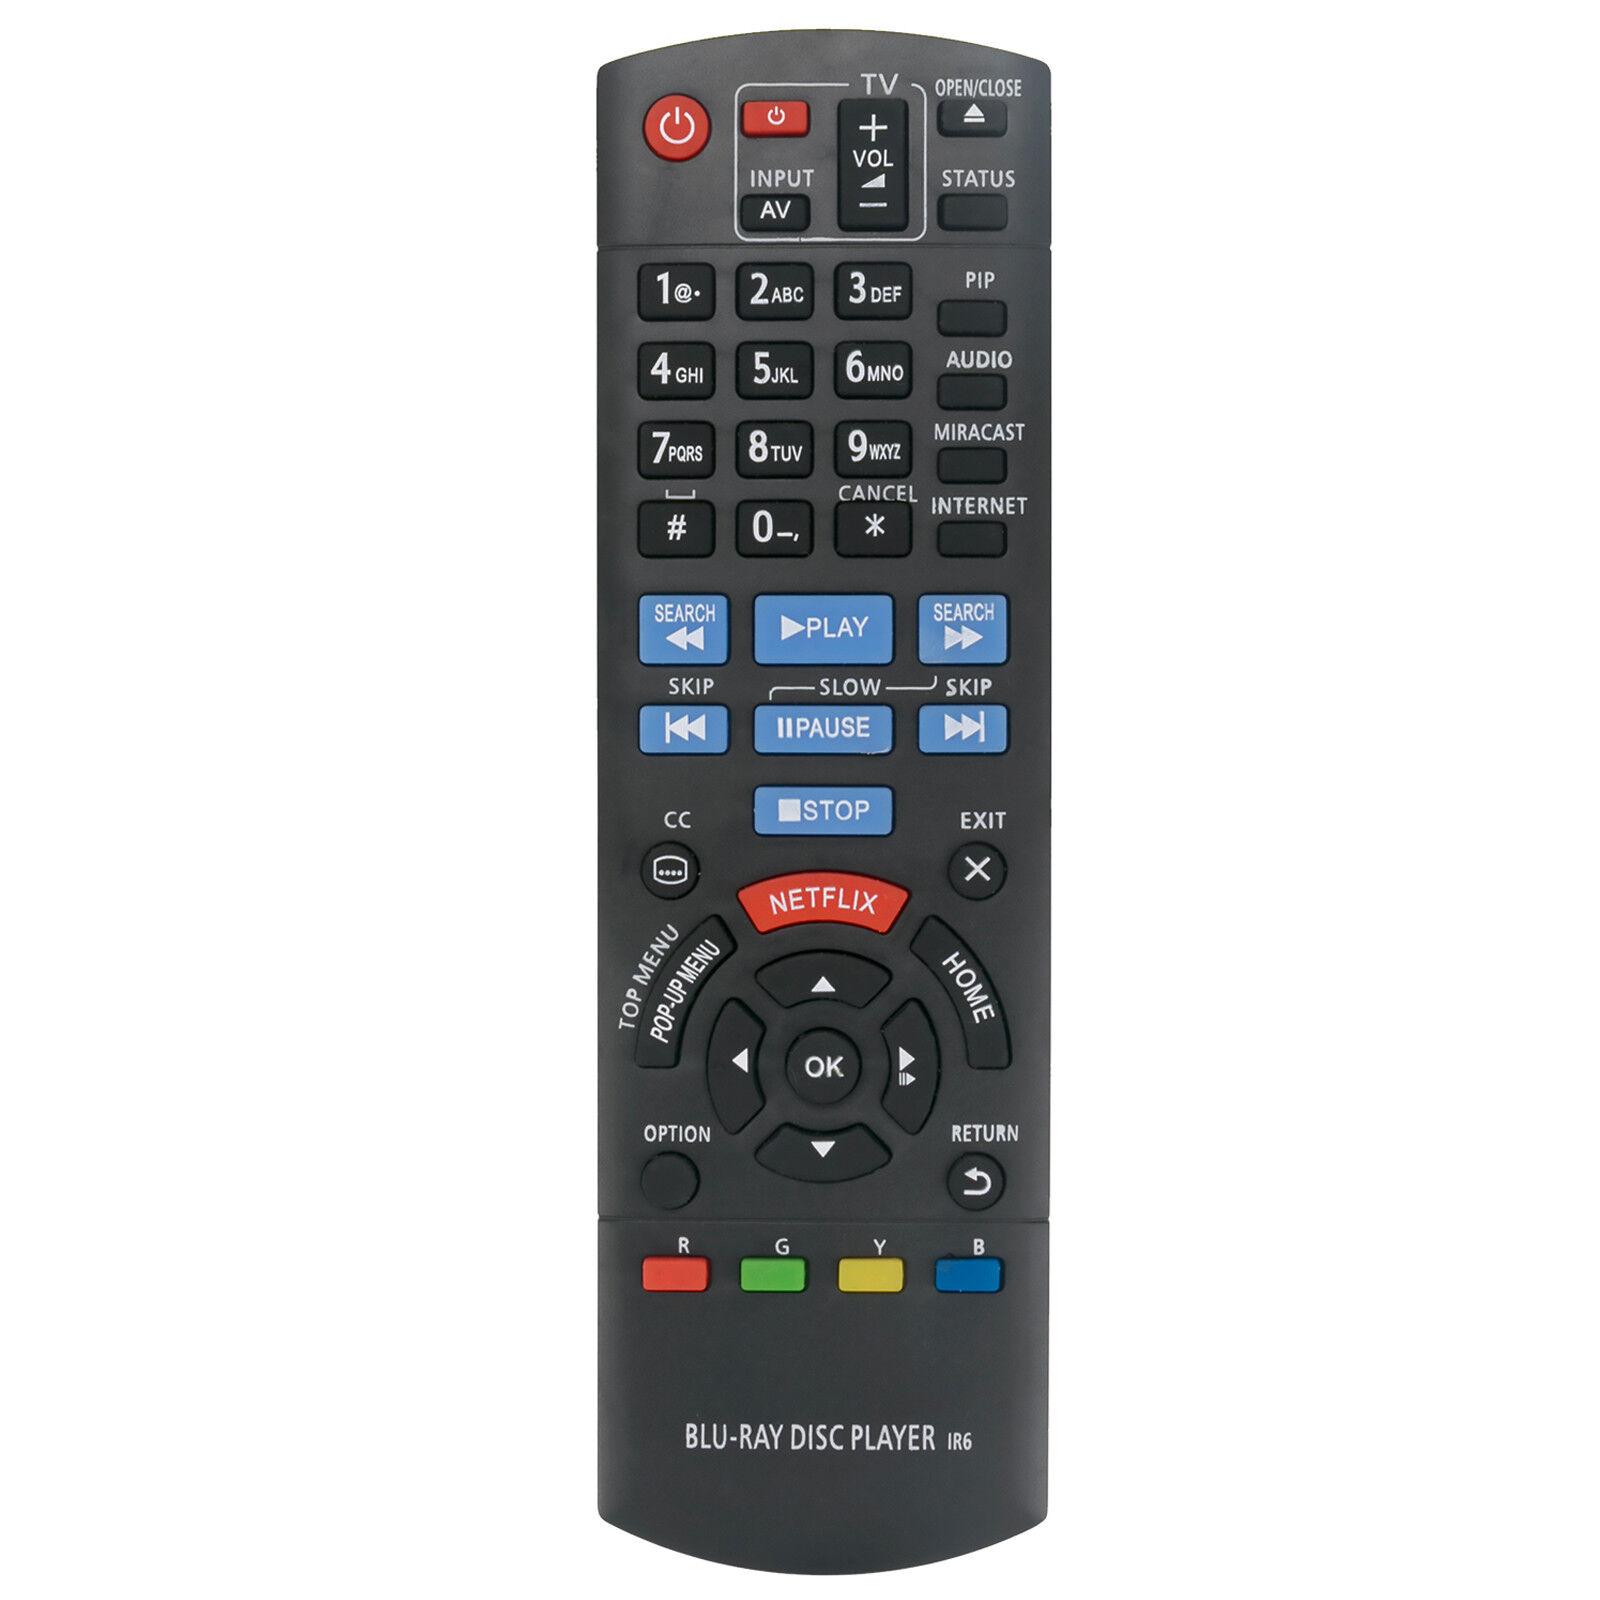 N2QAYA00080 Replace Remote Control for Panasonic Blu-ray Blu